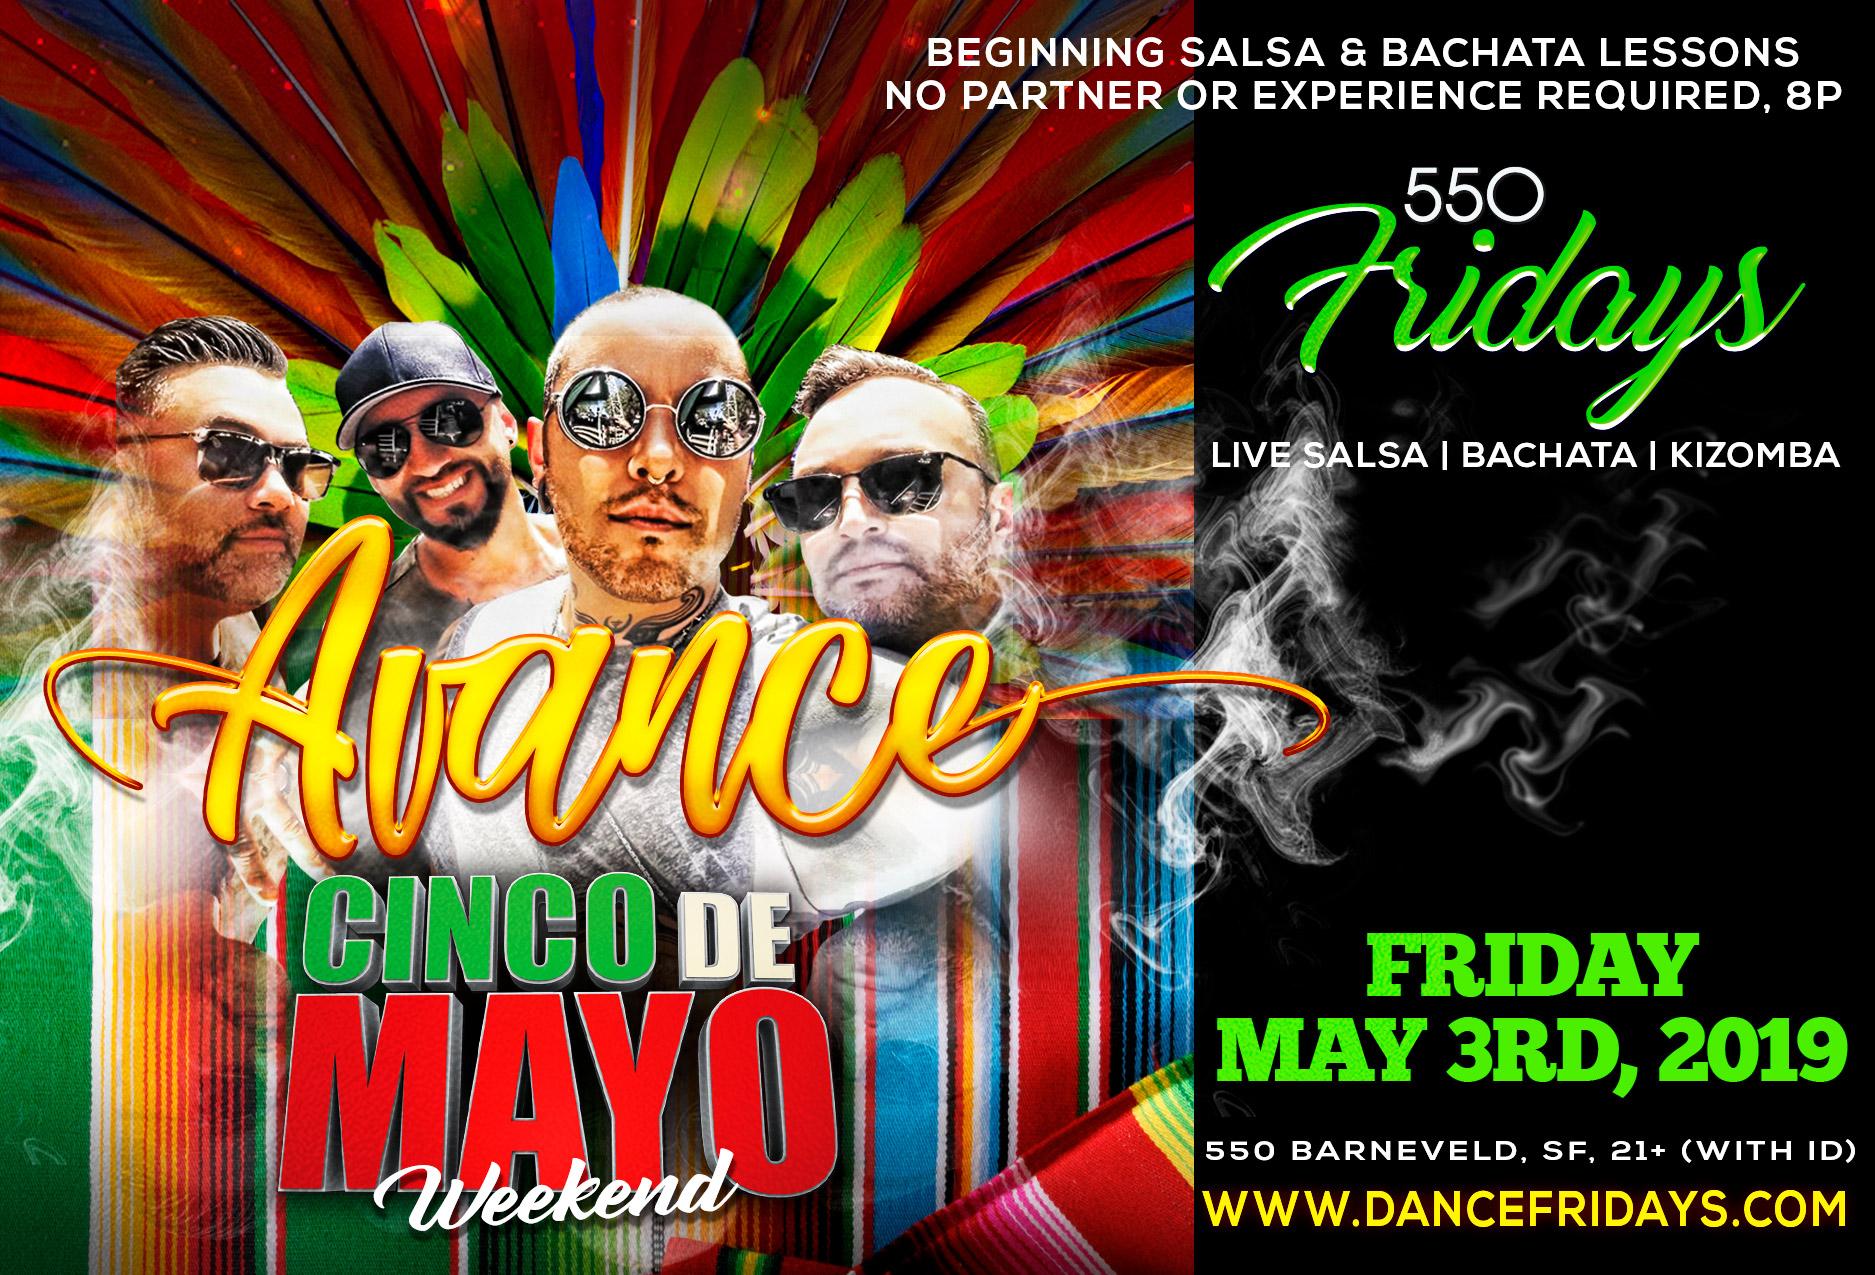 Dance Fridays